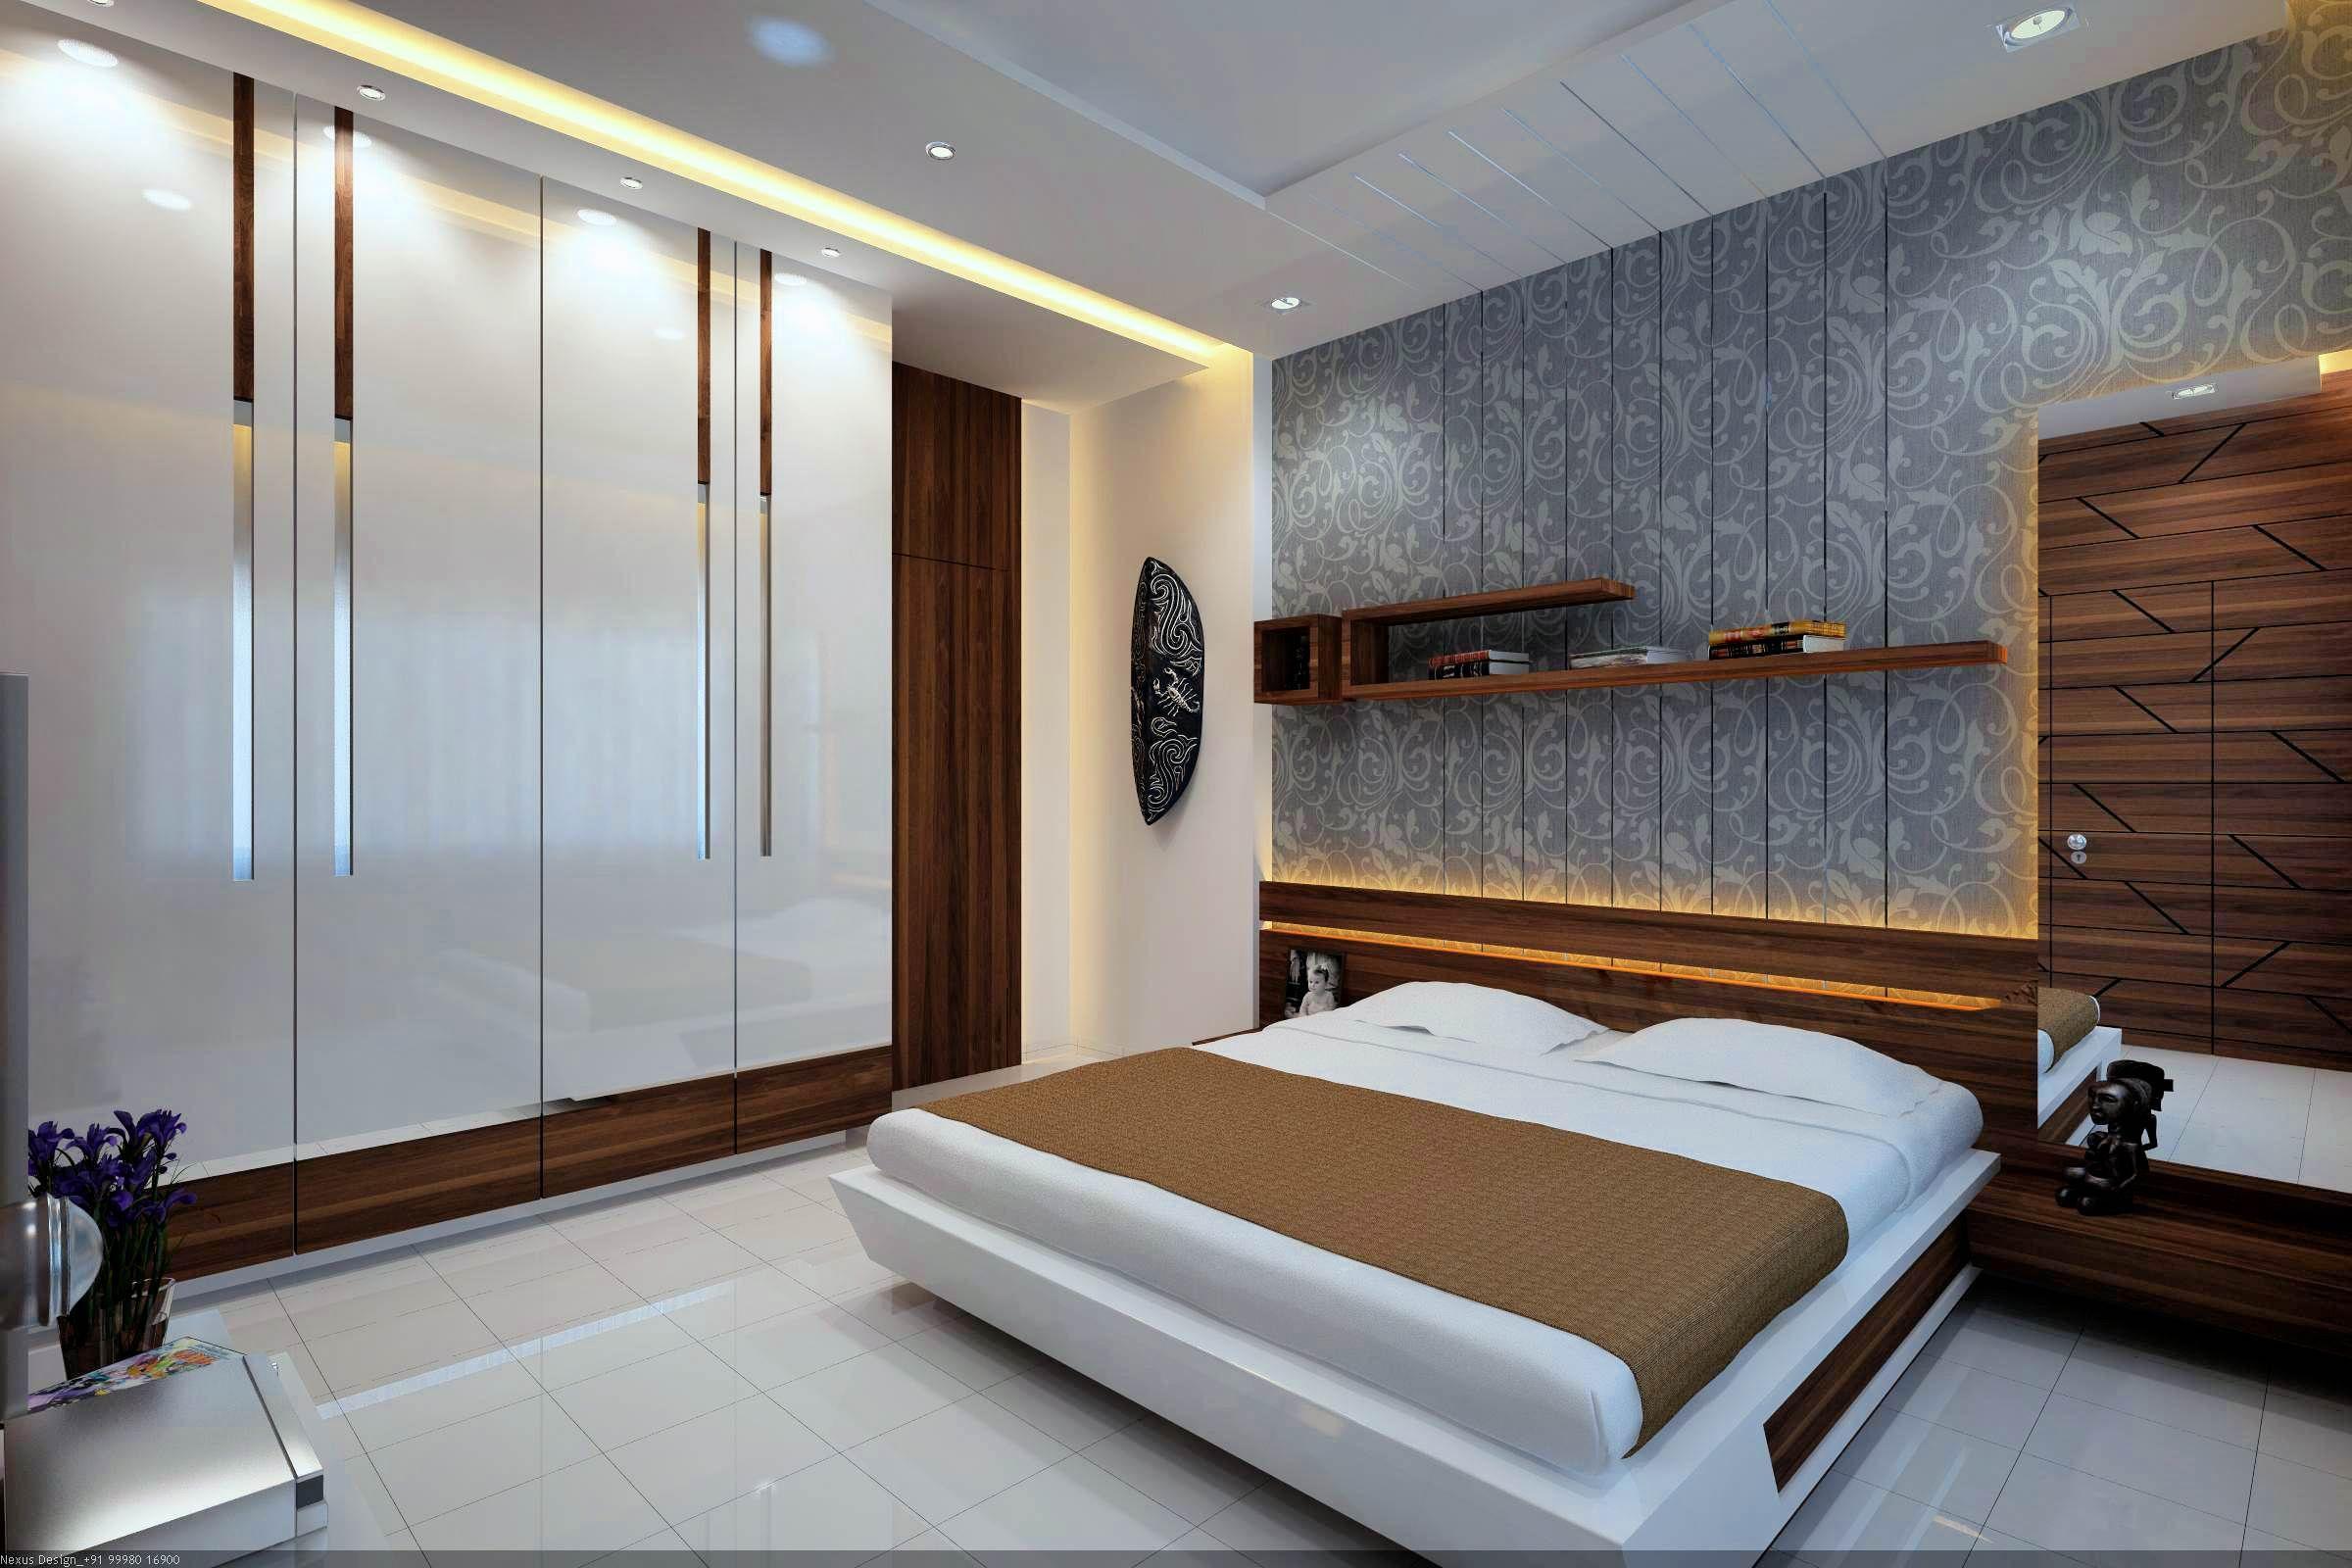 Pin by Ashok Suthar on WARDROBES | Wardrobe design bedroom ...